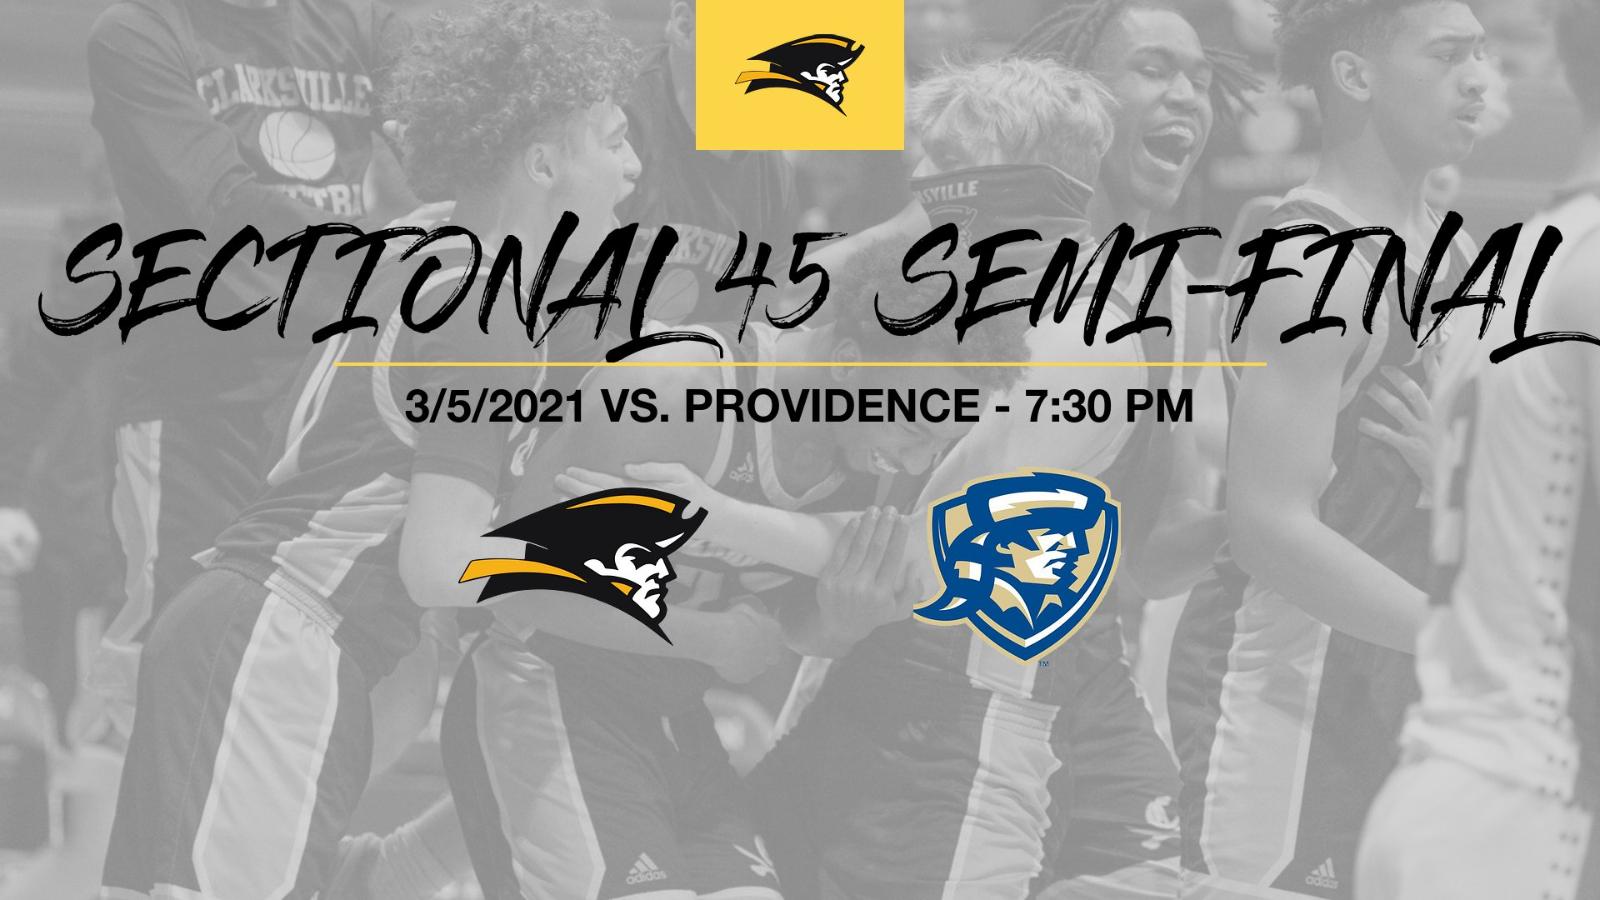 Boys Basketball Sectional vs. Providence 3/5/2021